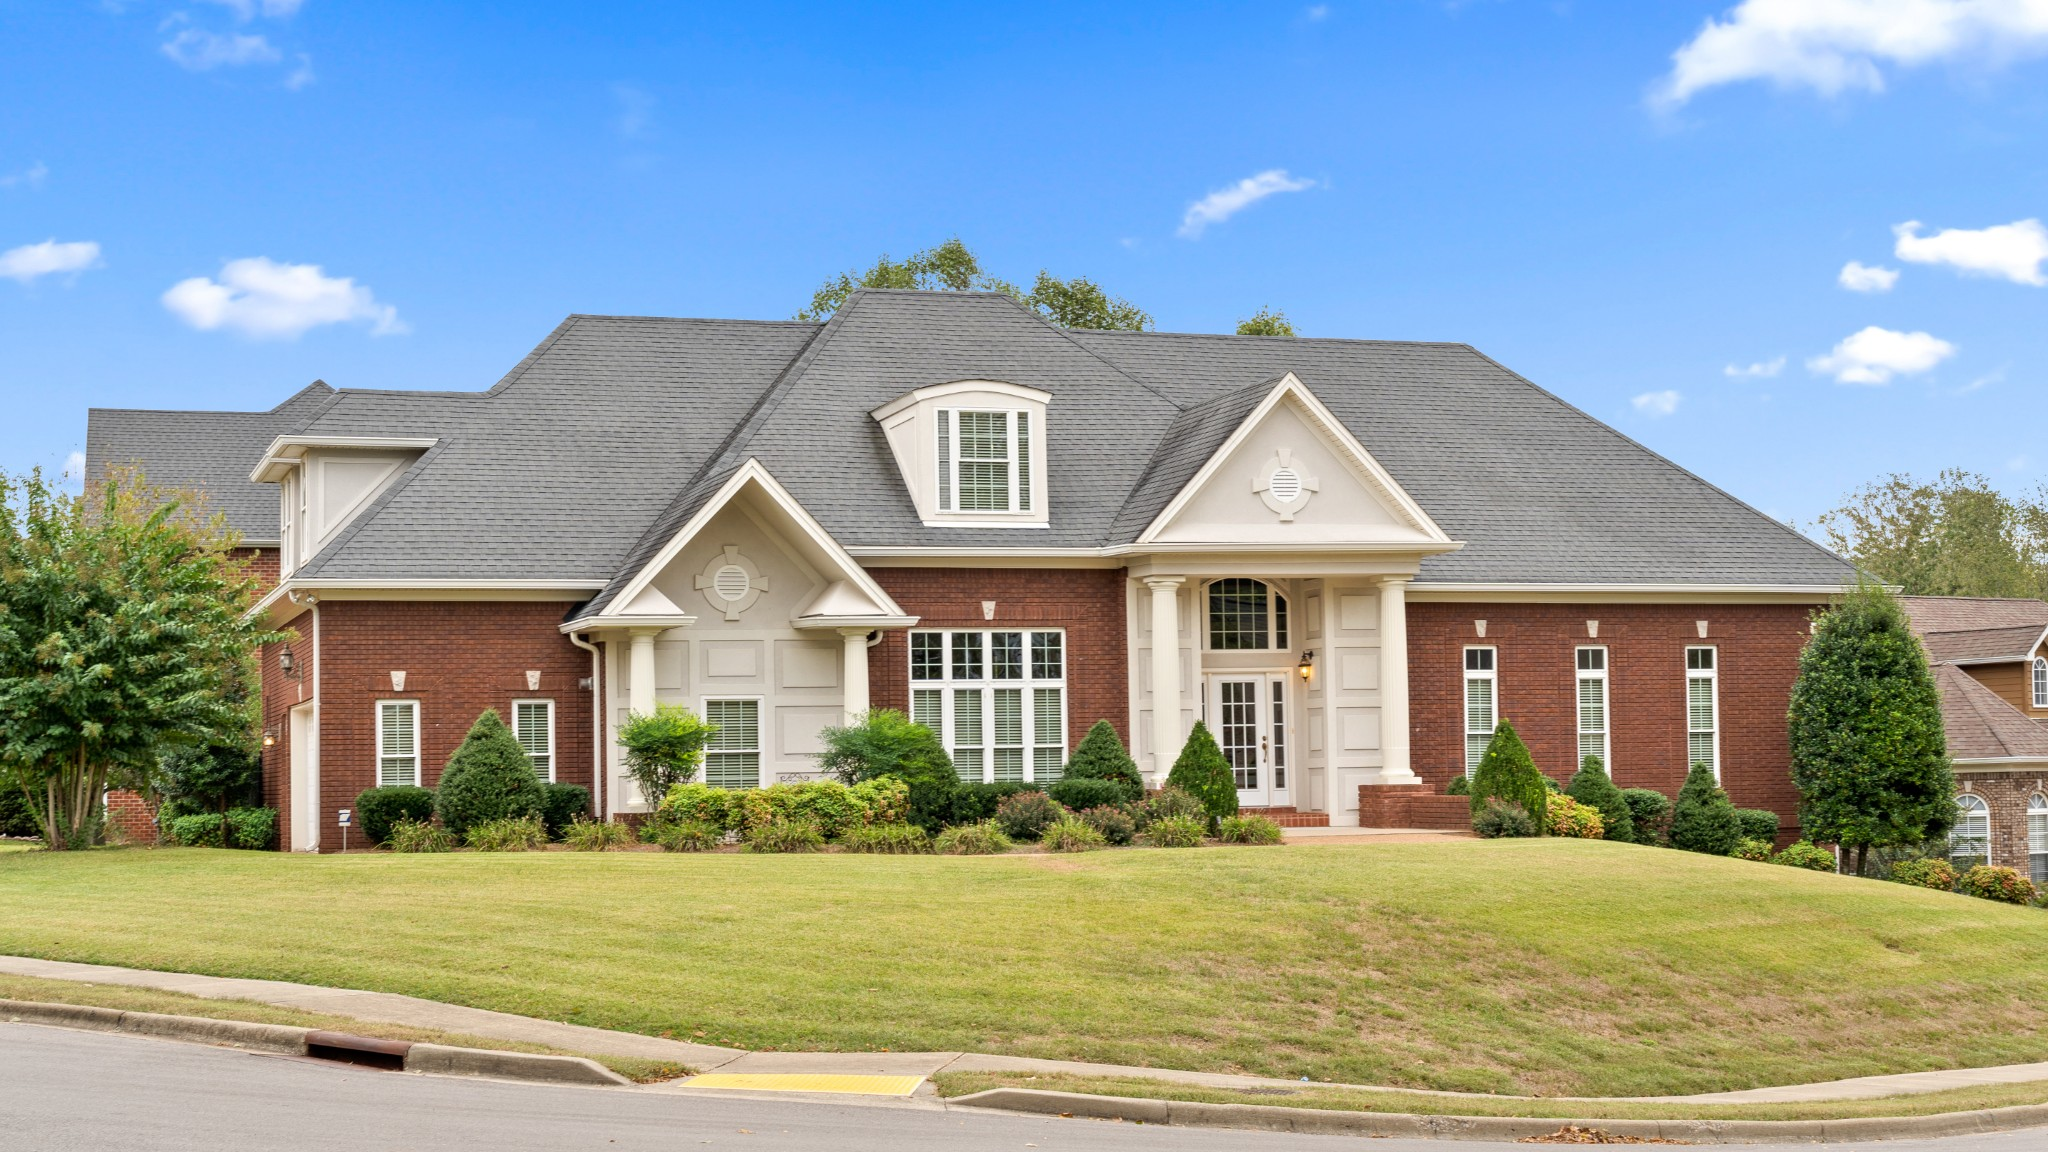 832 Glastonbury Ct, Clarksville, TN 37043 - Clarksville, TN real estate listing